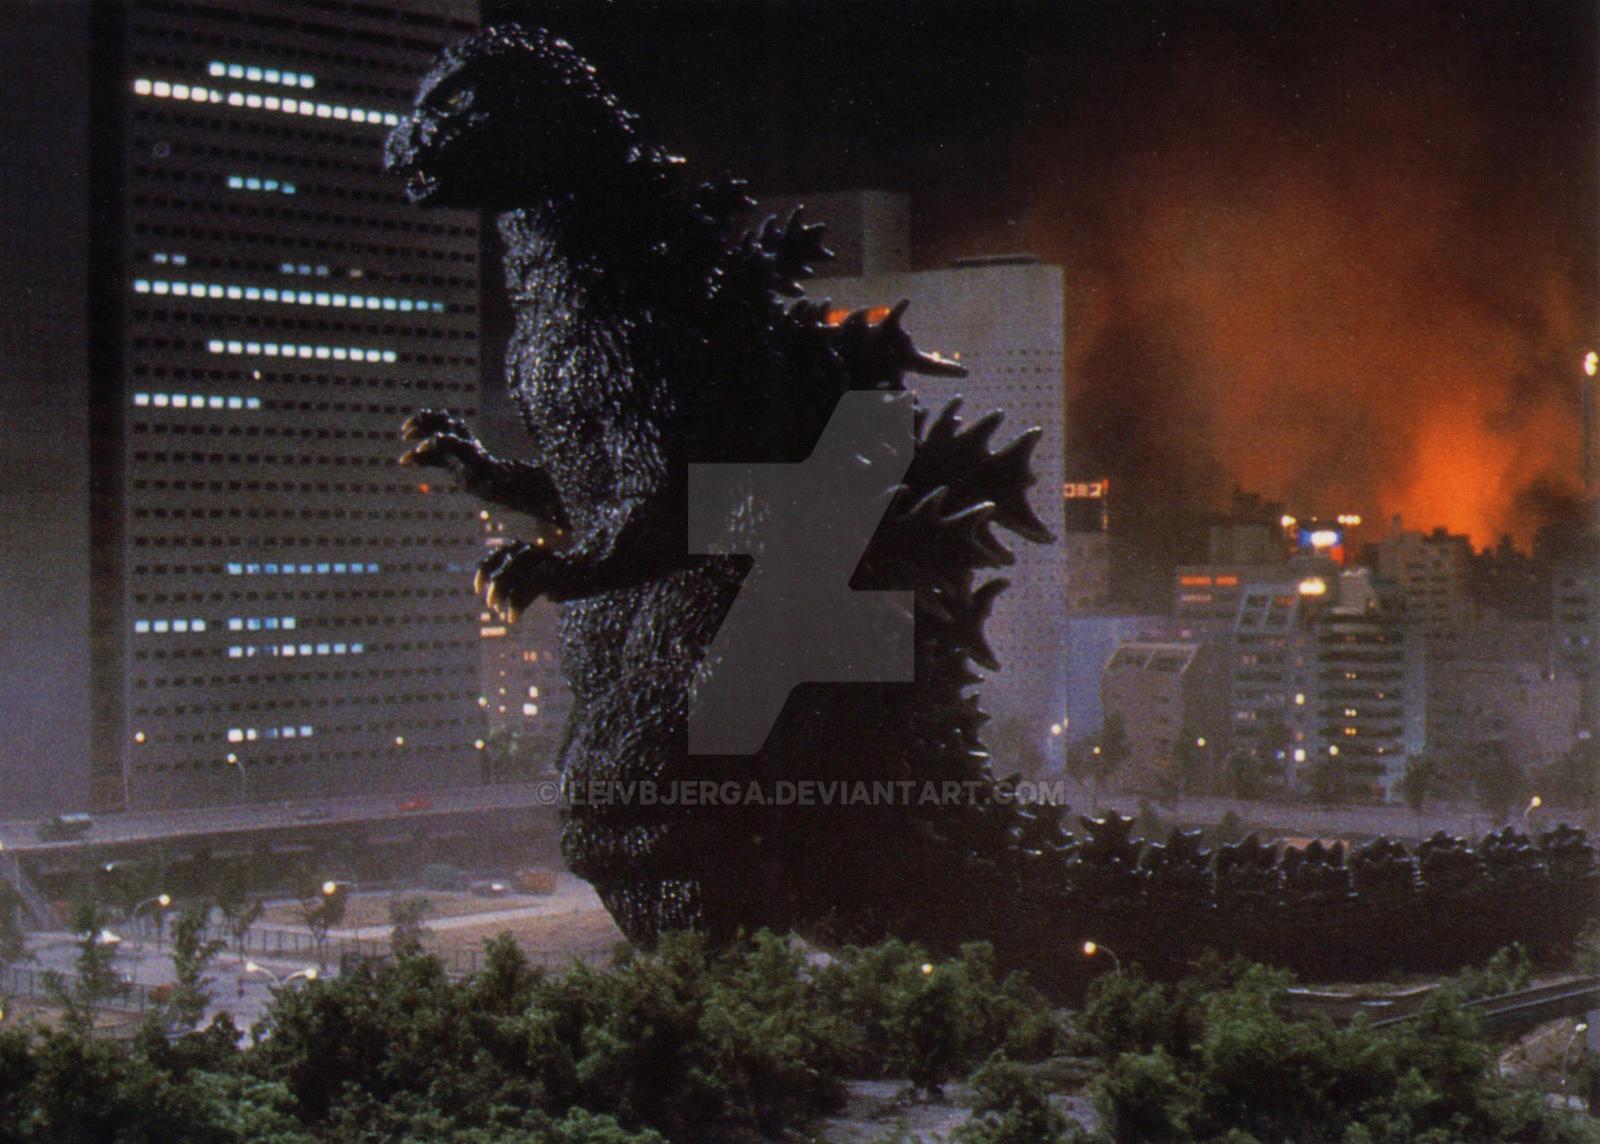 Godzilla 1984/1985 by leivbjerga on DeviantArt